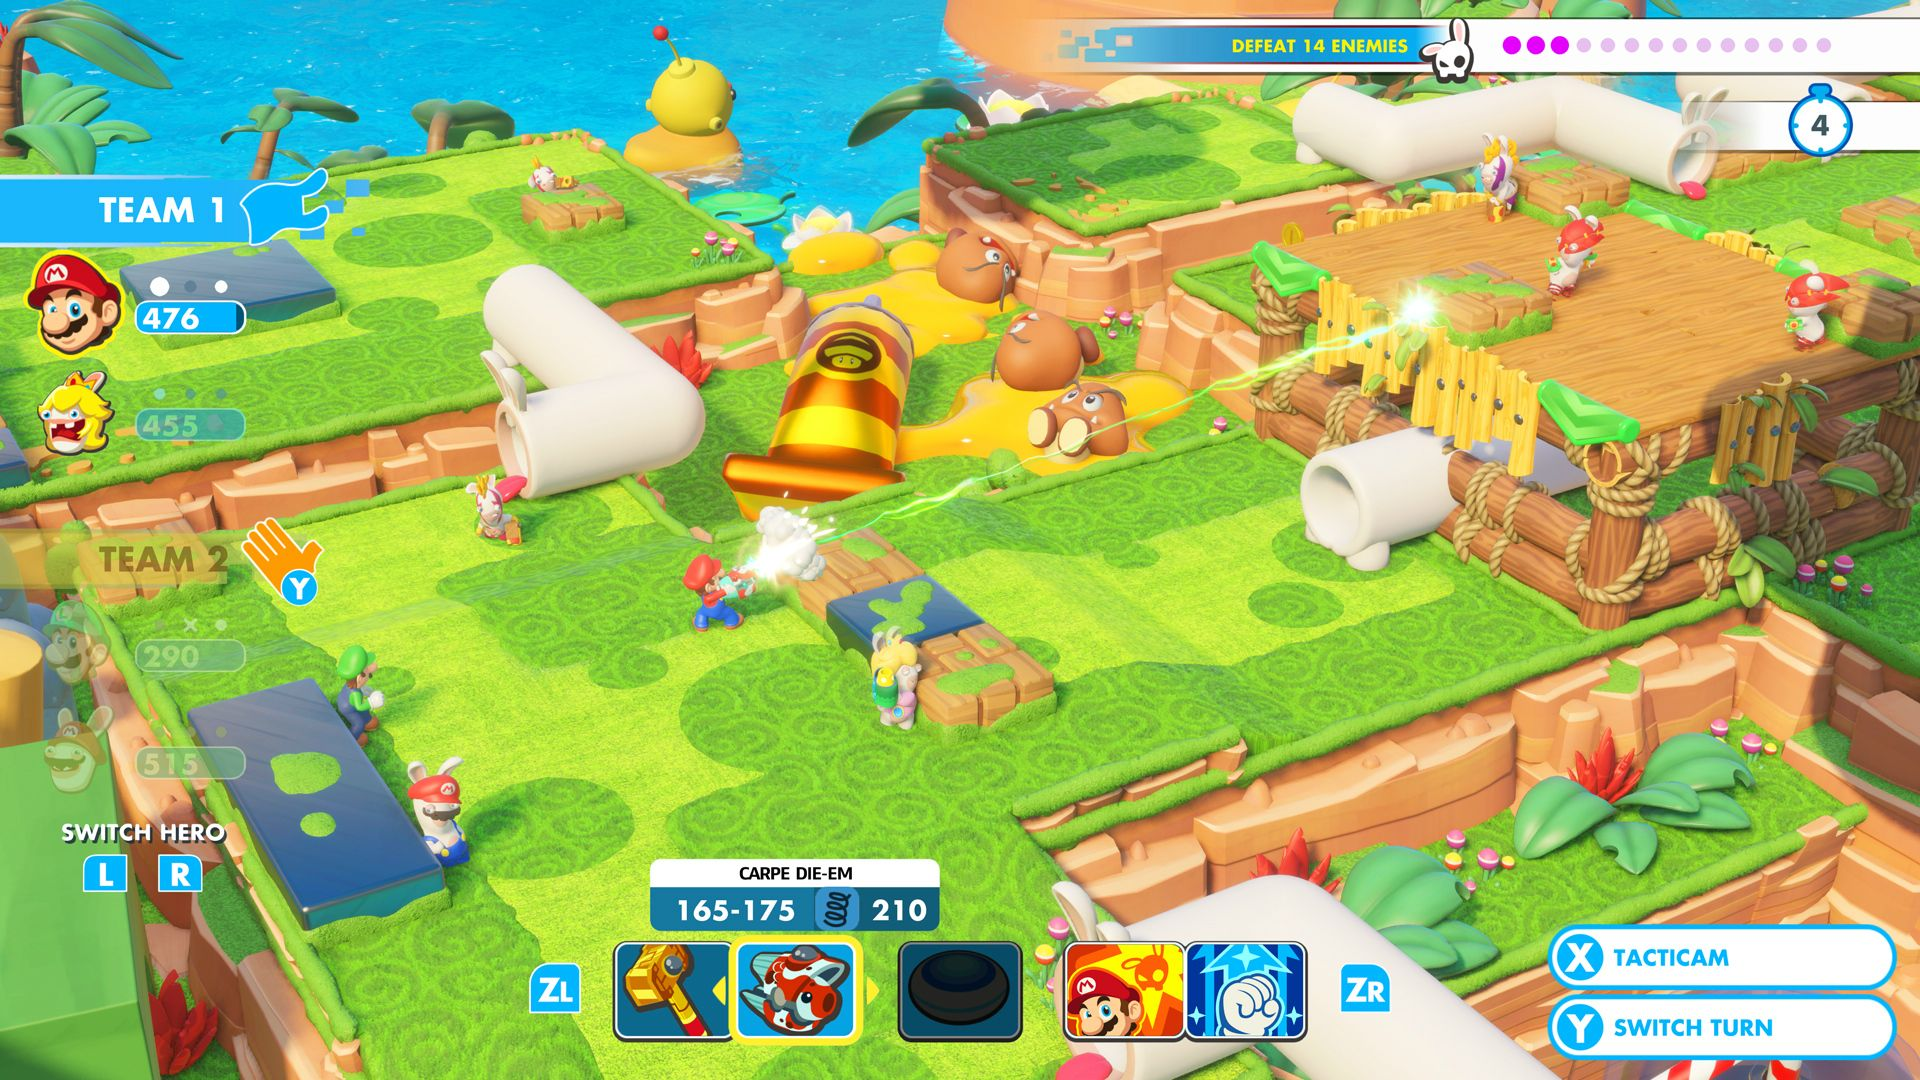 Mario + Rabbids Kingdom Battle Coop Challenges and